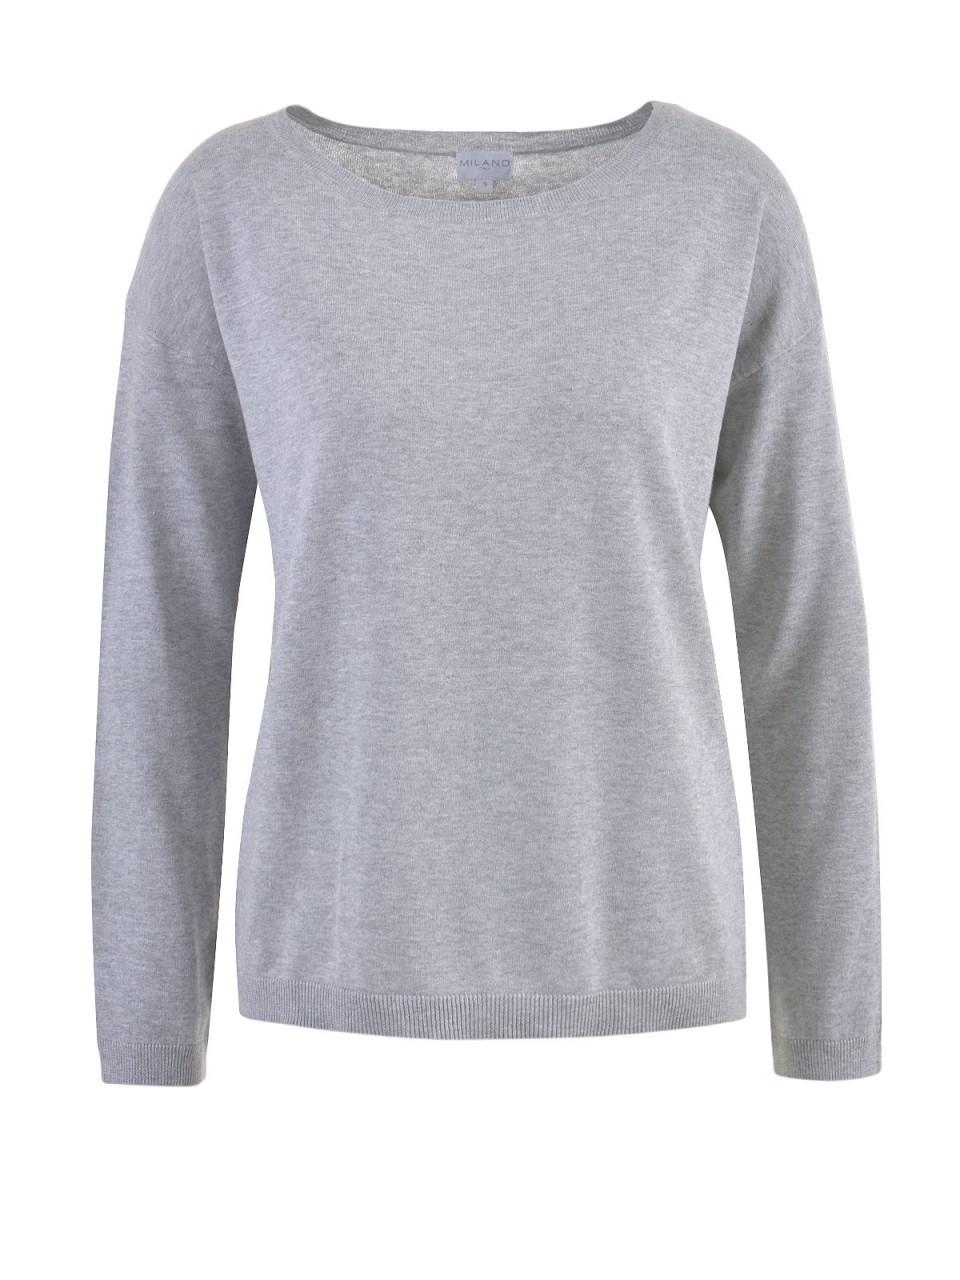 milano-italy-damen-pullover-grau